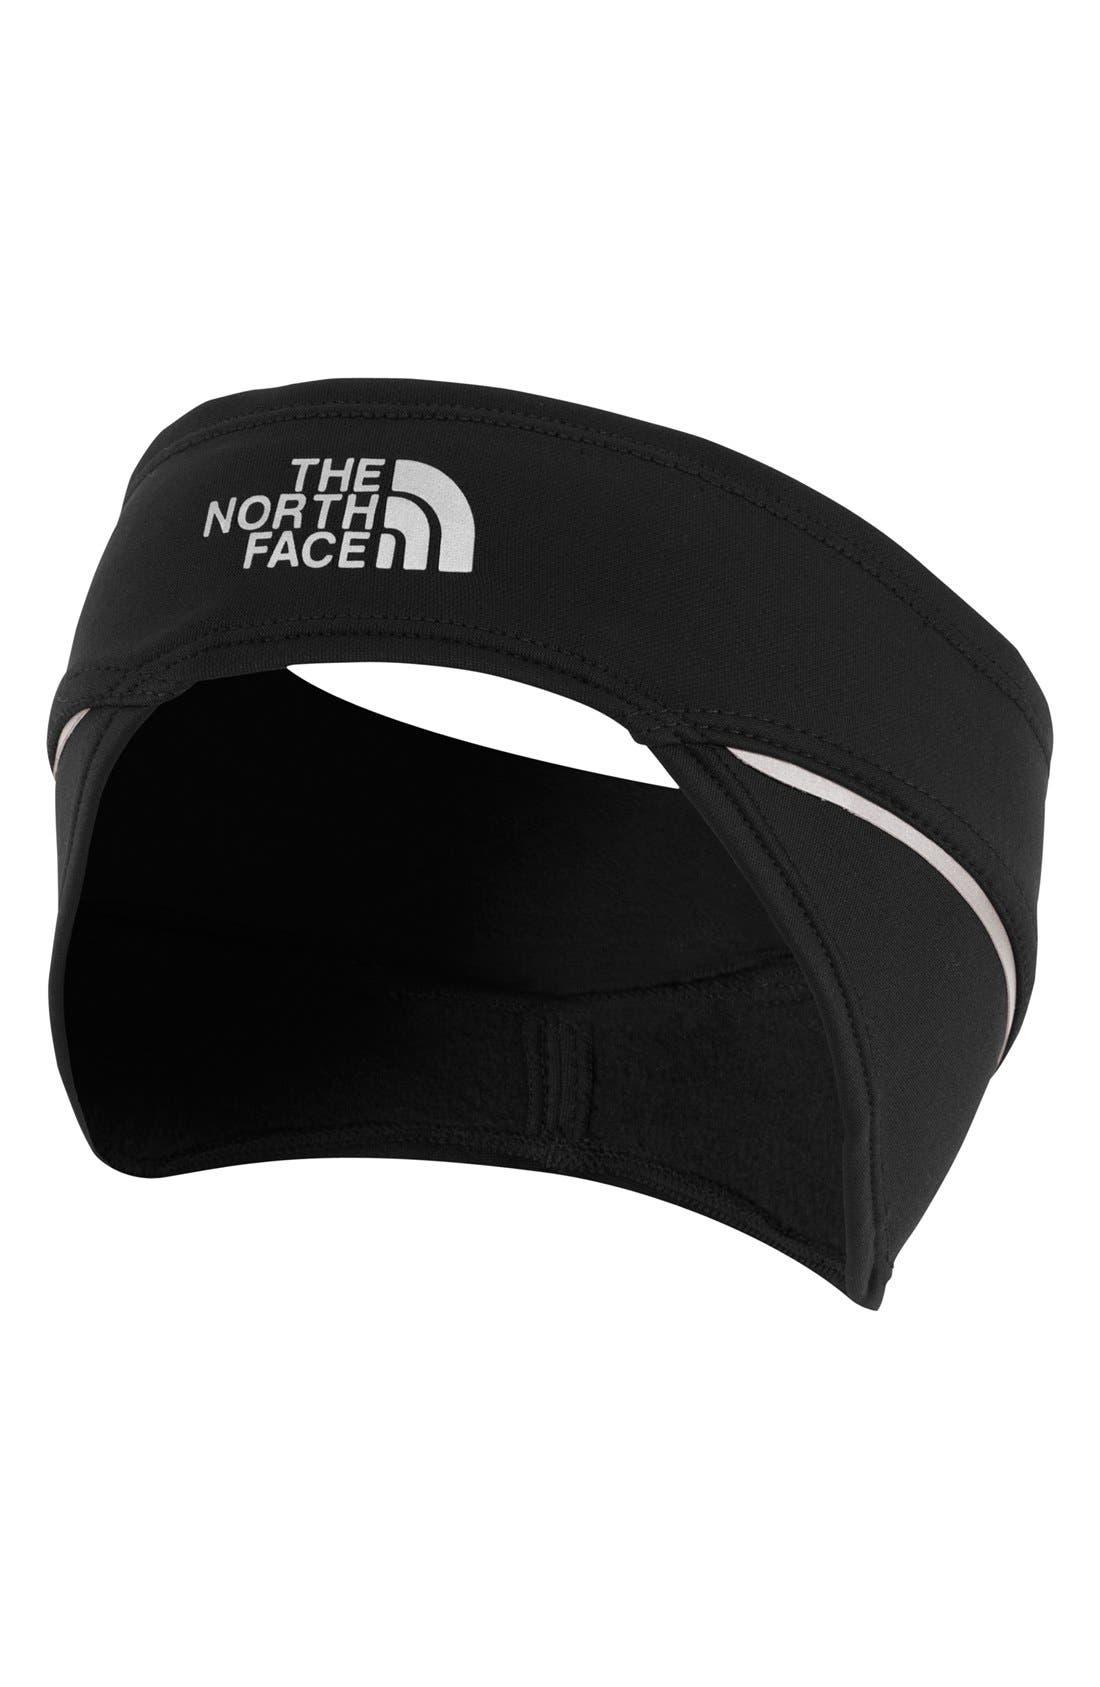 Main Image - The North Face 'Momentum' Ear Band